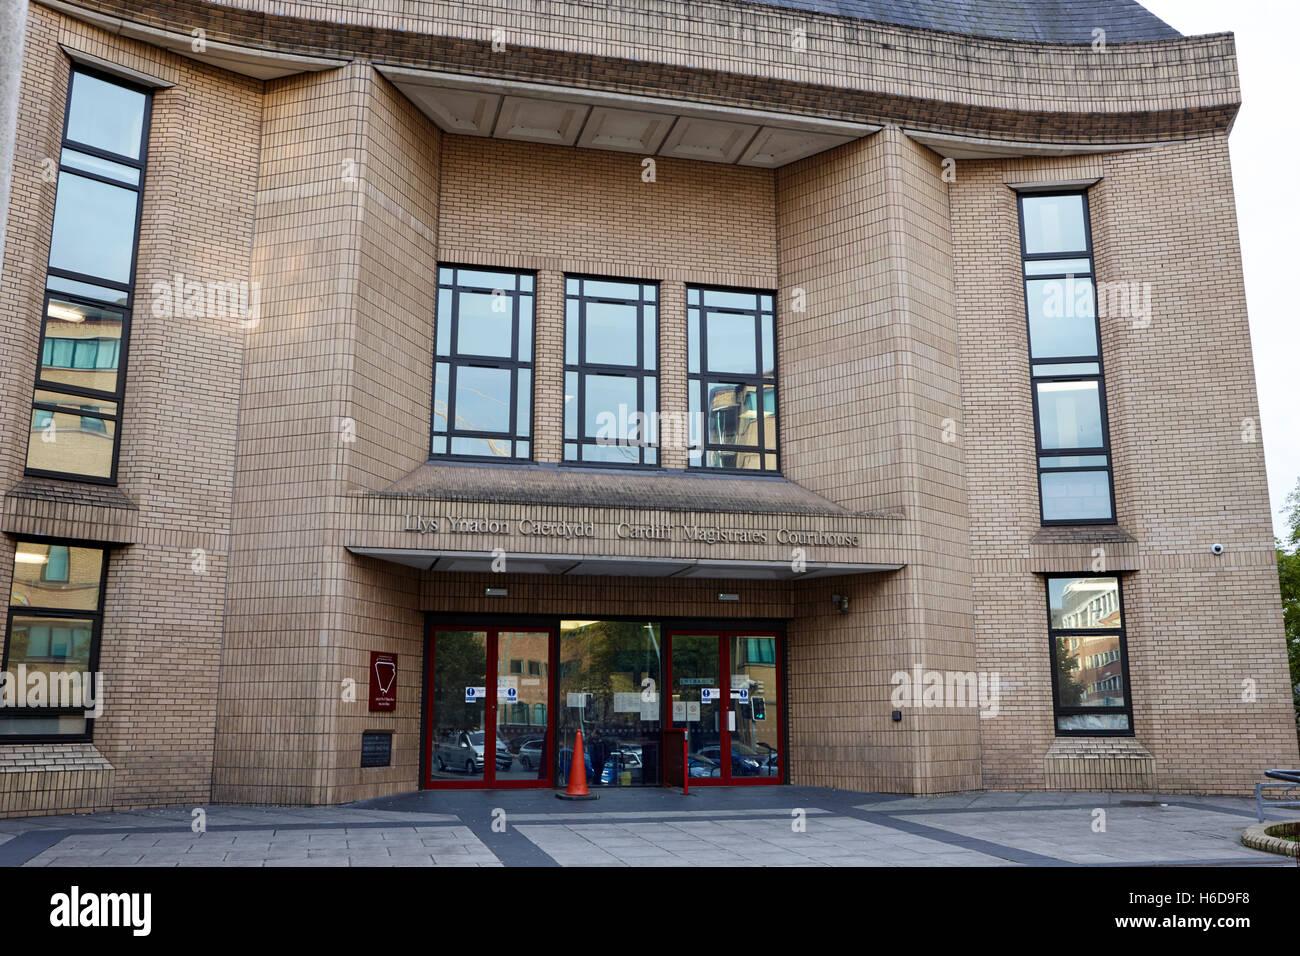 Cardiff Magistrates Court Wales United Kingdom - Stock Image